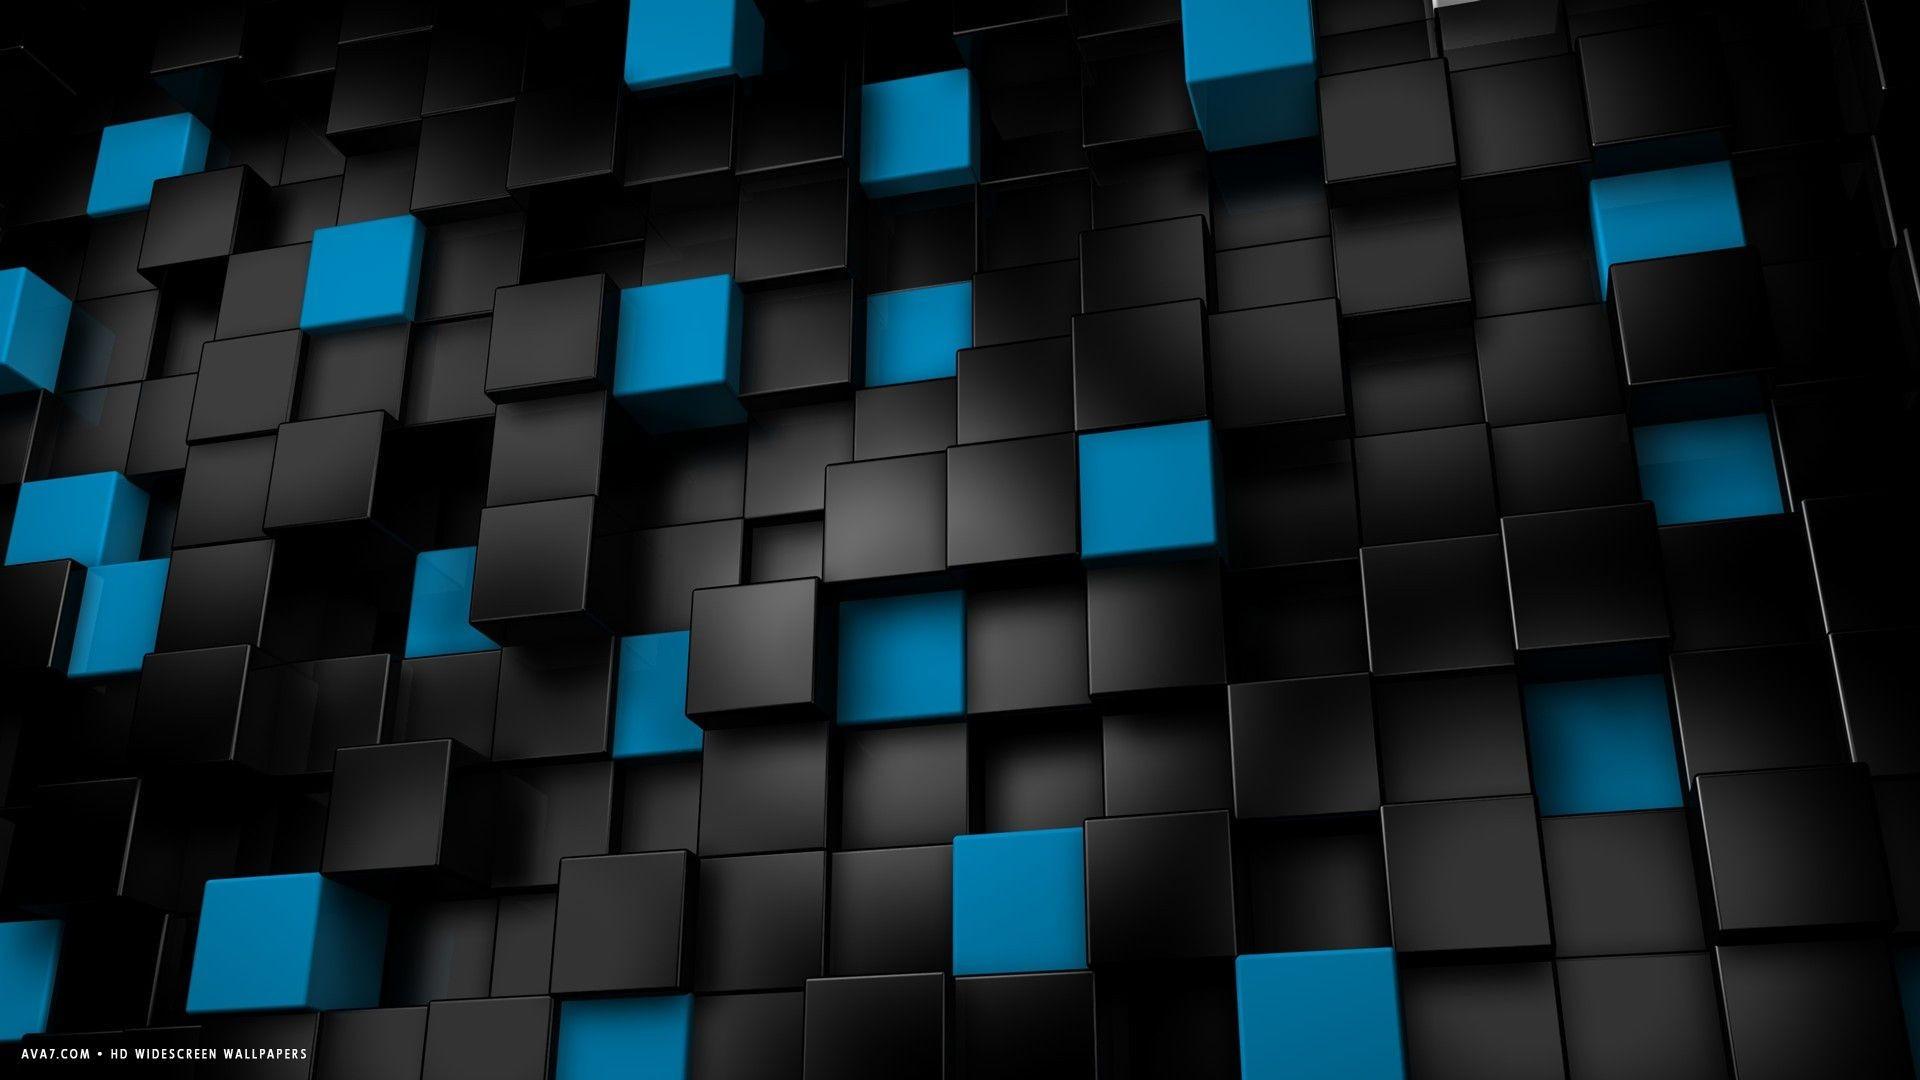 HD Wallpapers p Widescreen 1600×1000 Widescreen Wallpapers 1080p (49  Wallpapers) | Adorable